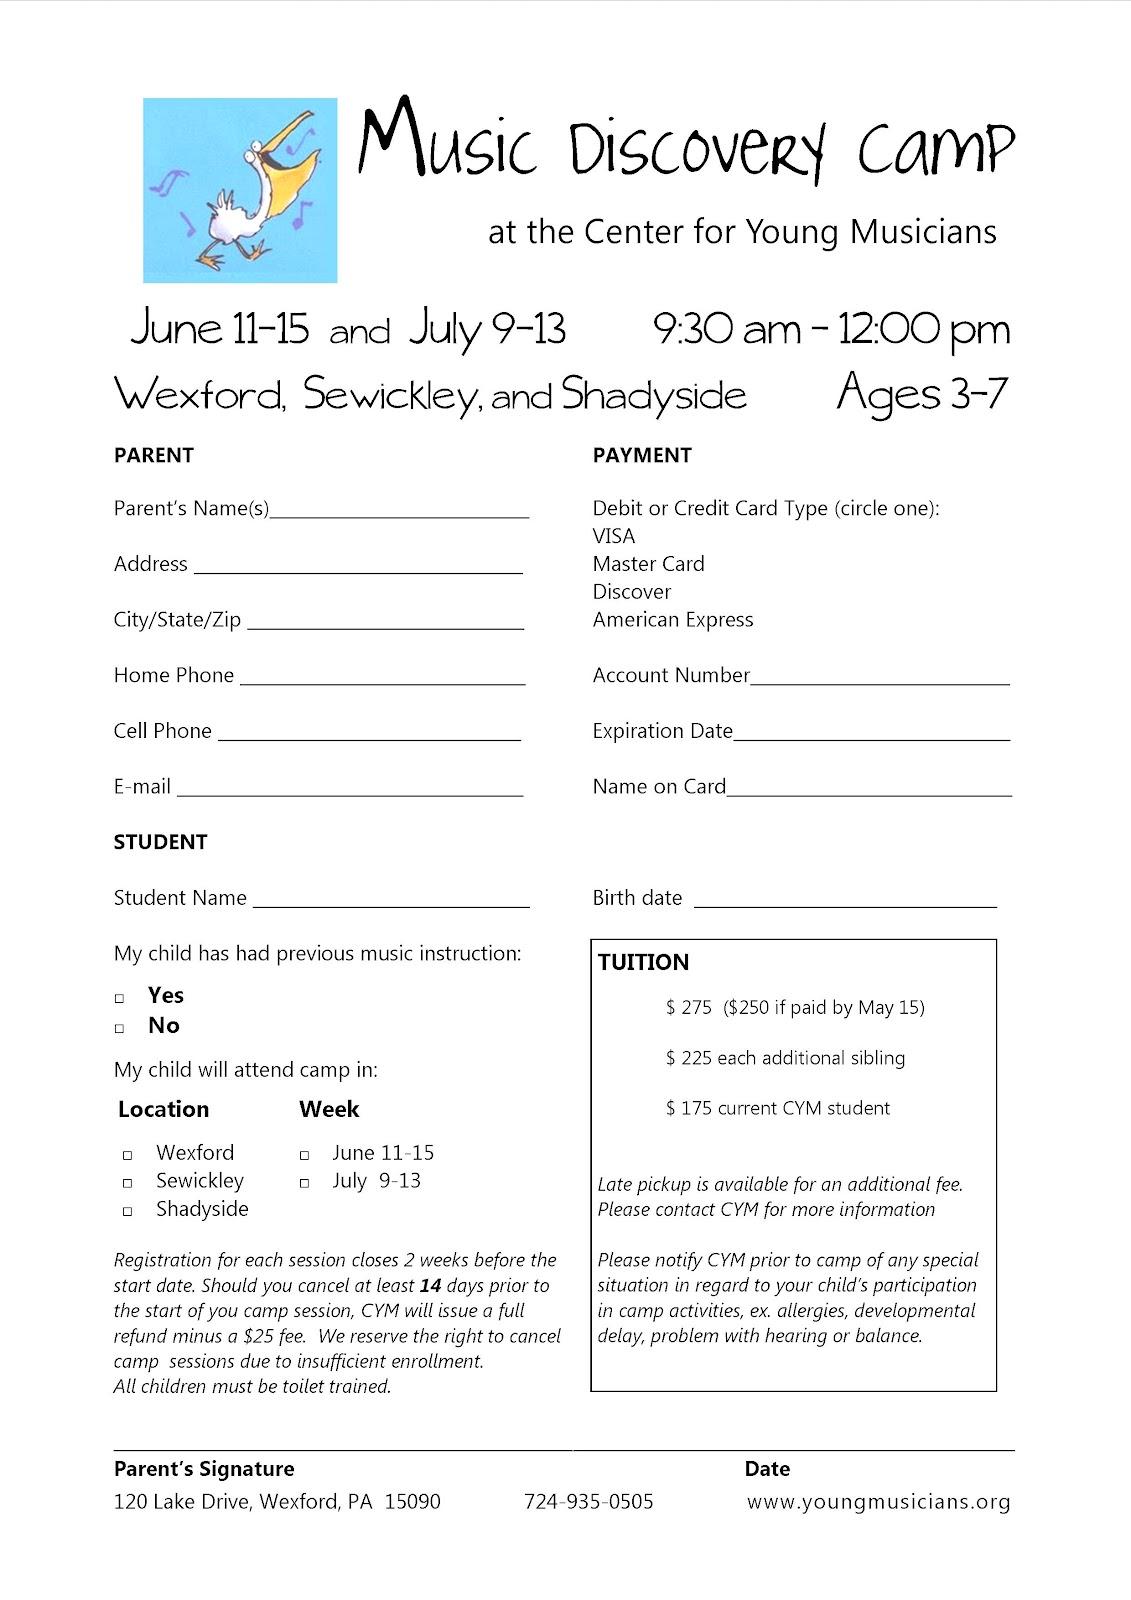 Doc12751650 Student Application Form Template Student – Sample School Registration Form